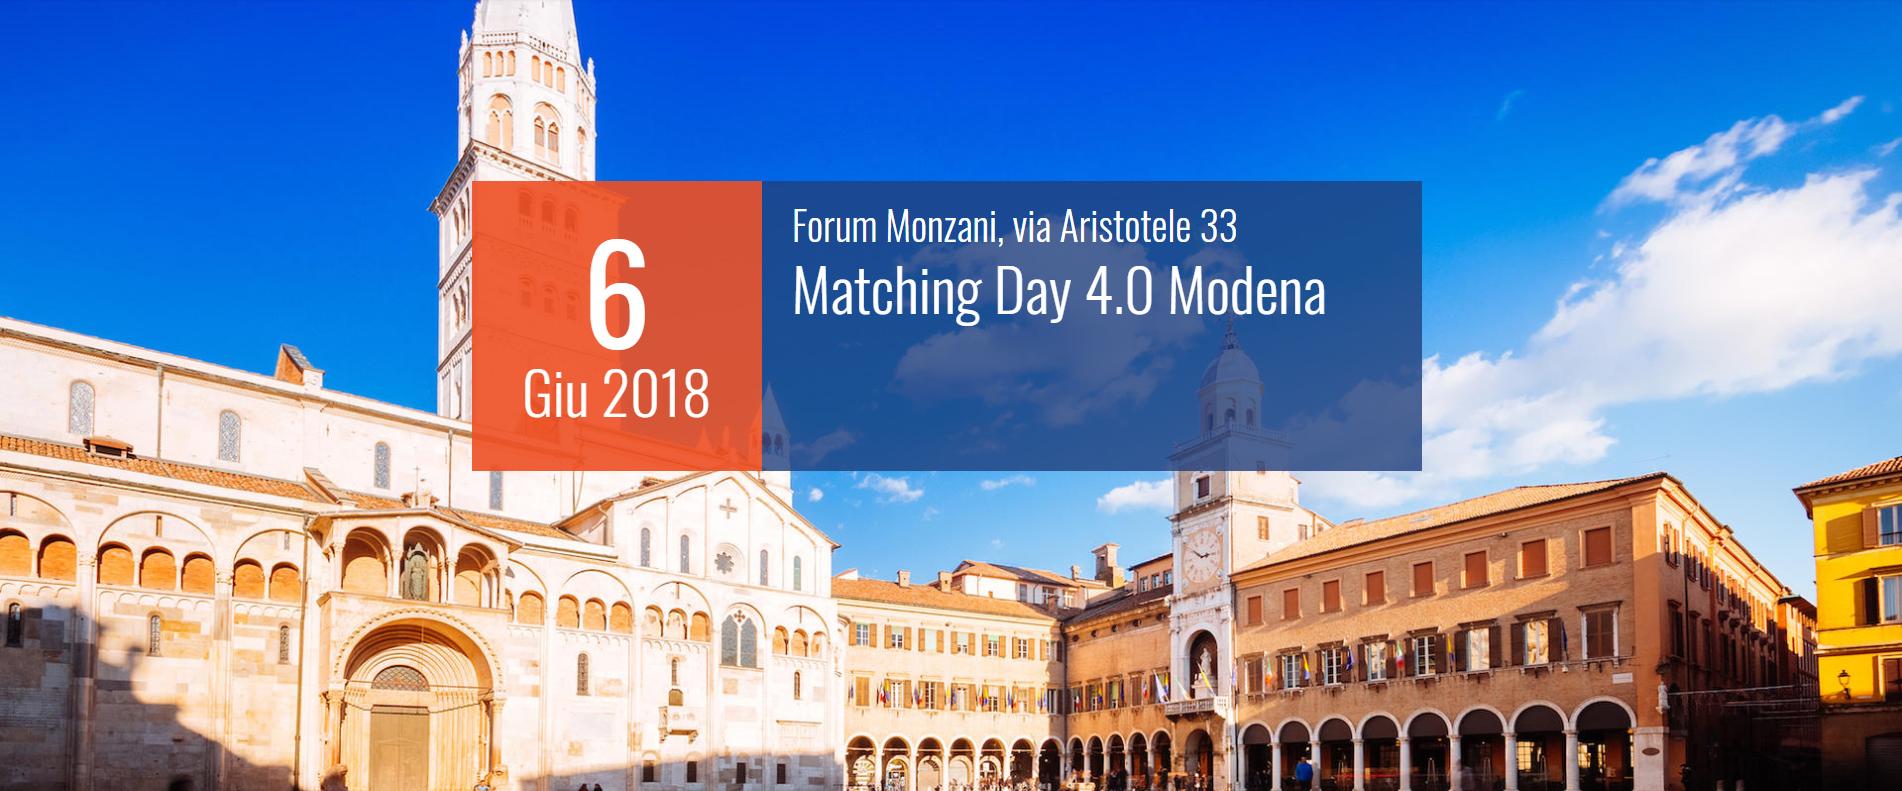 Arriva a Modena il Matching Day 4.0